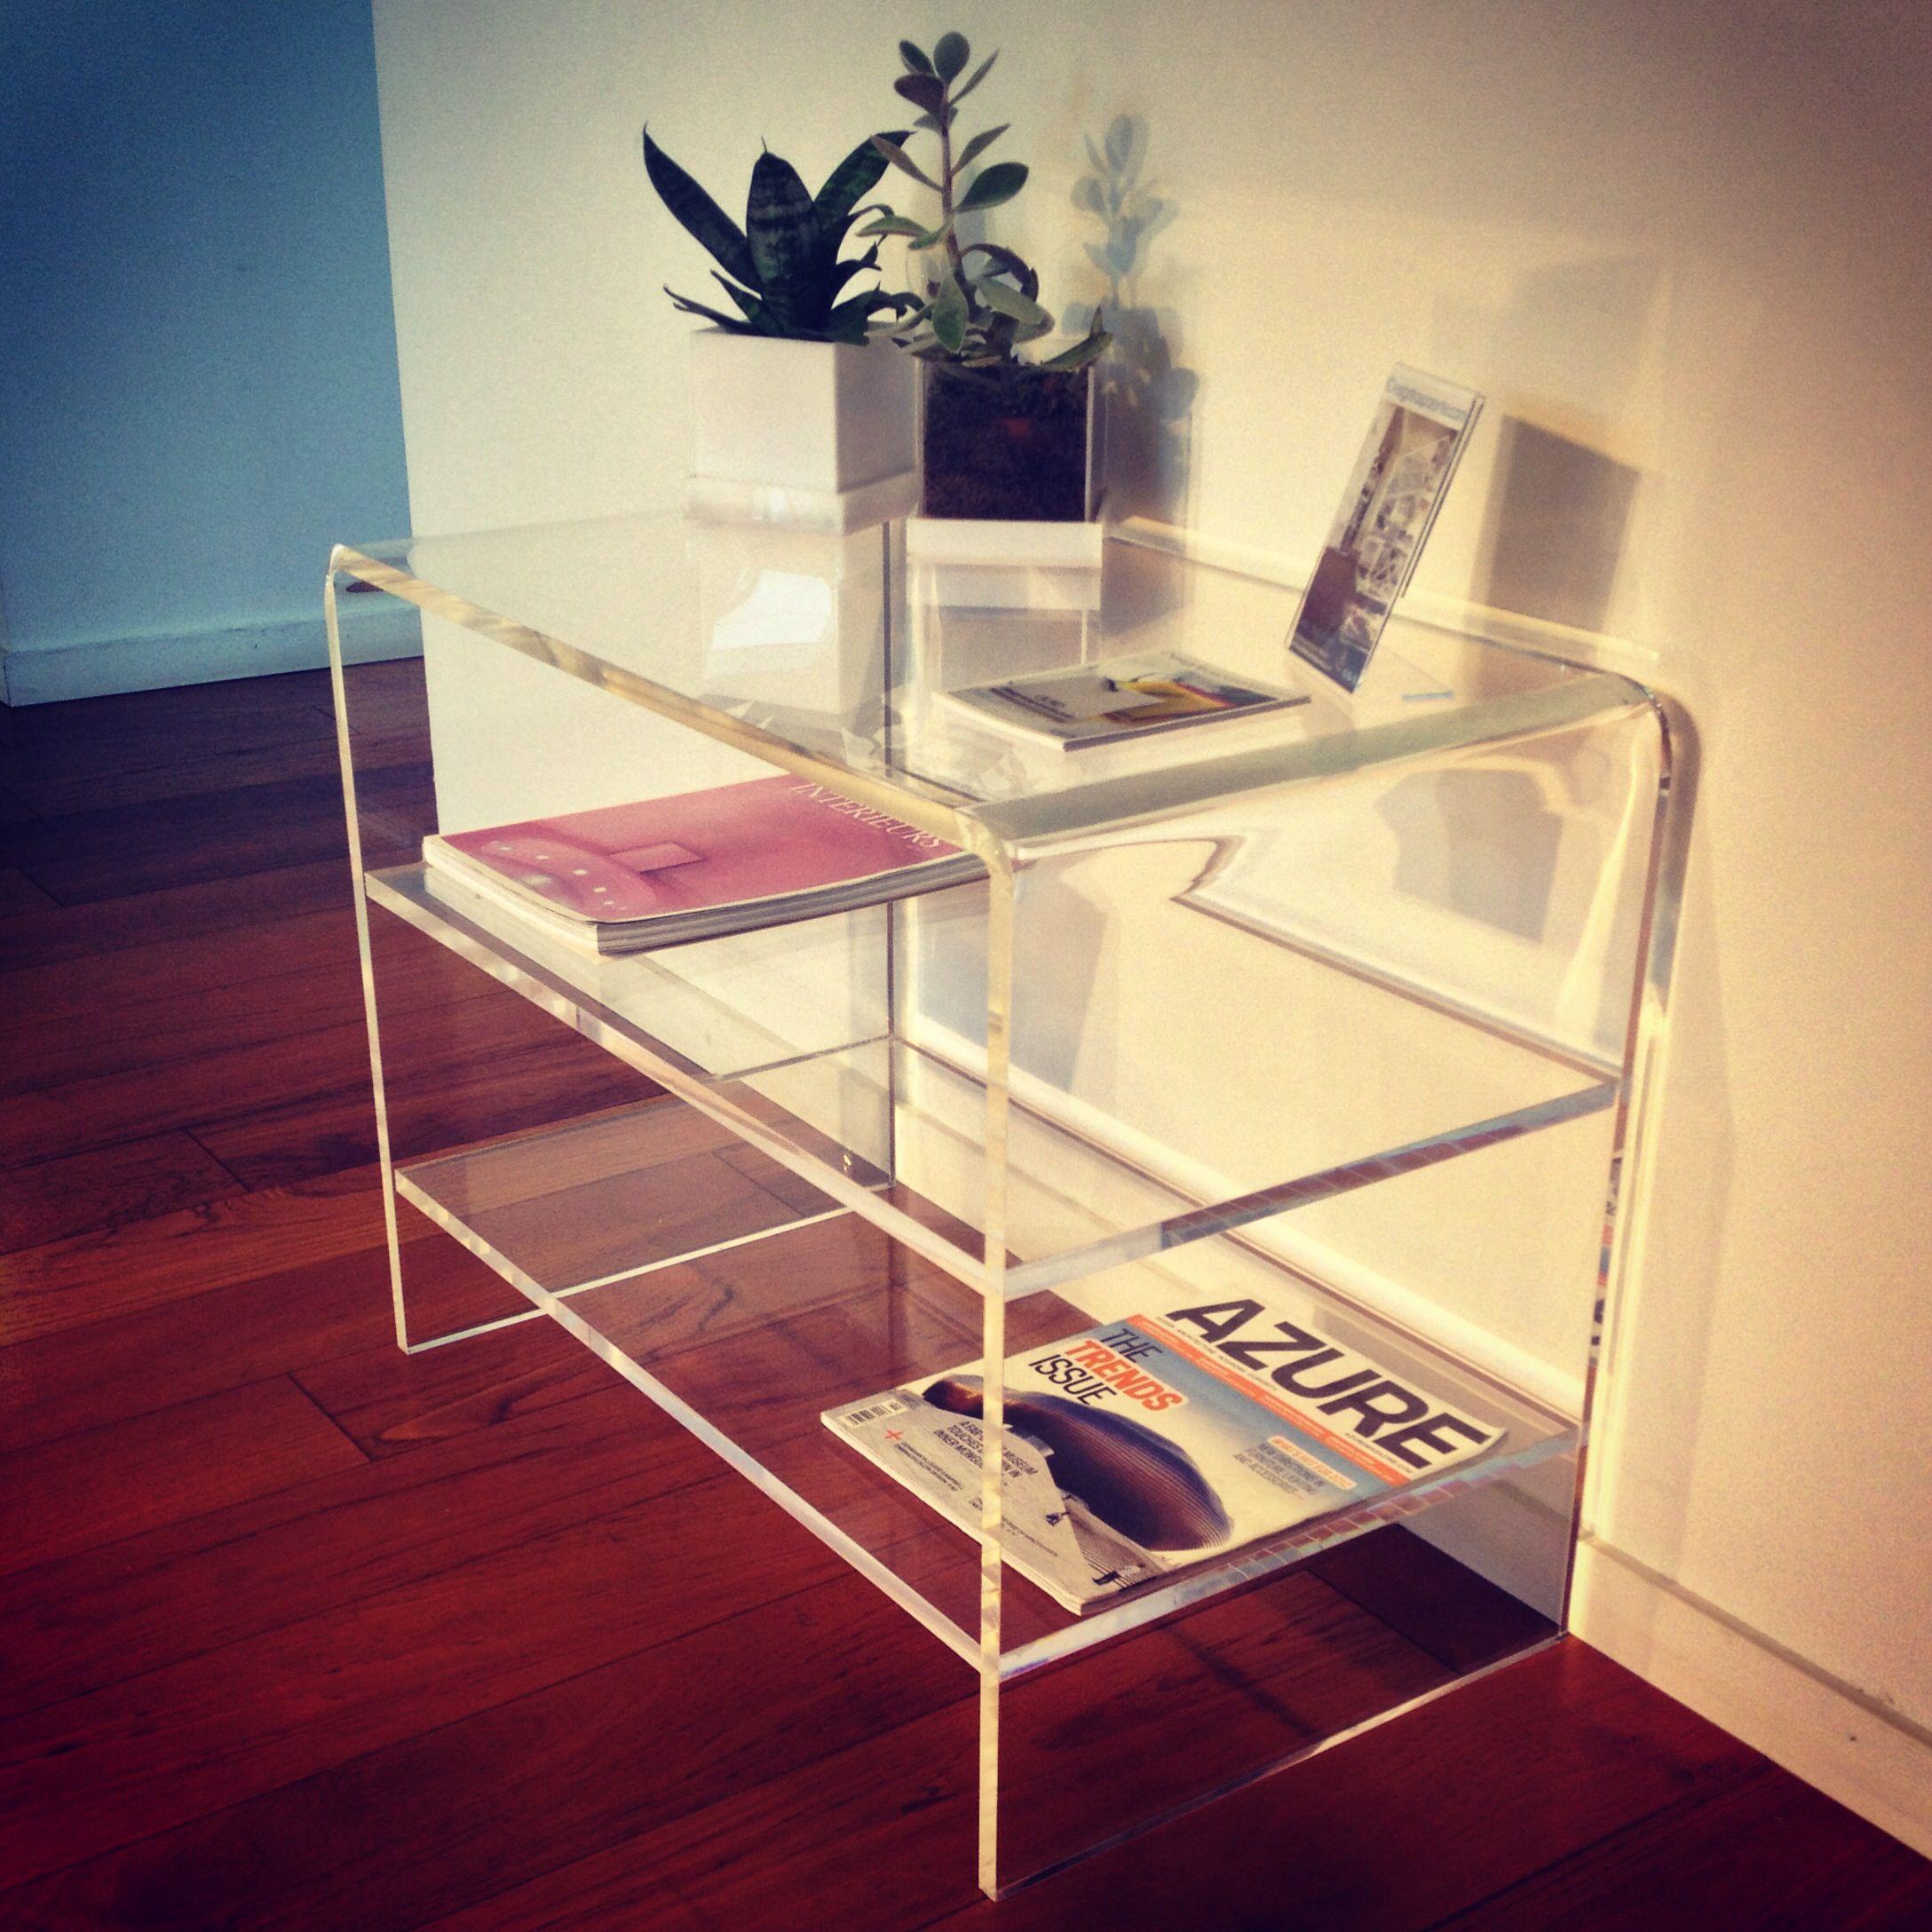 Clear acrylic desk table by designtrasparente console table tv clear acrylic desk table by designtrasparente console table tv holder geotapseo Gallery